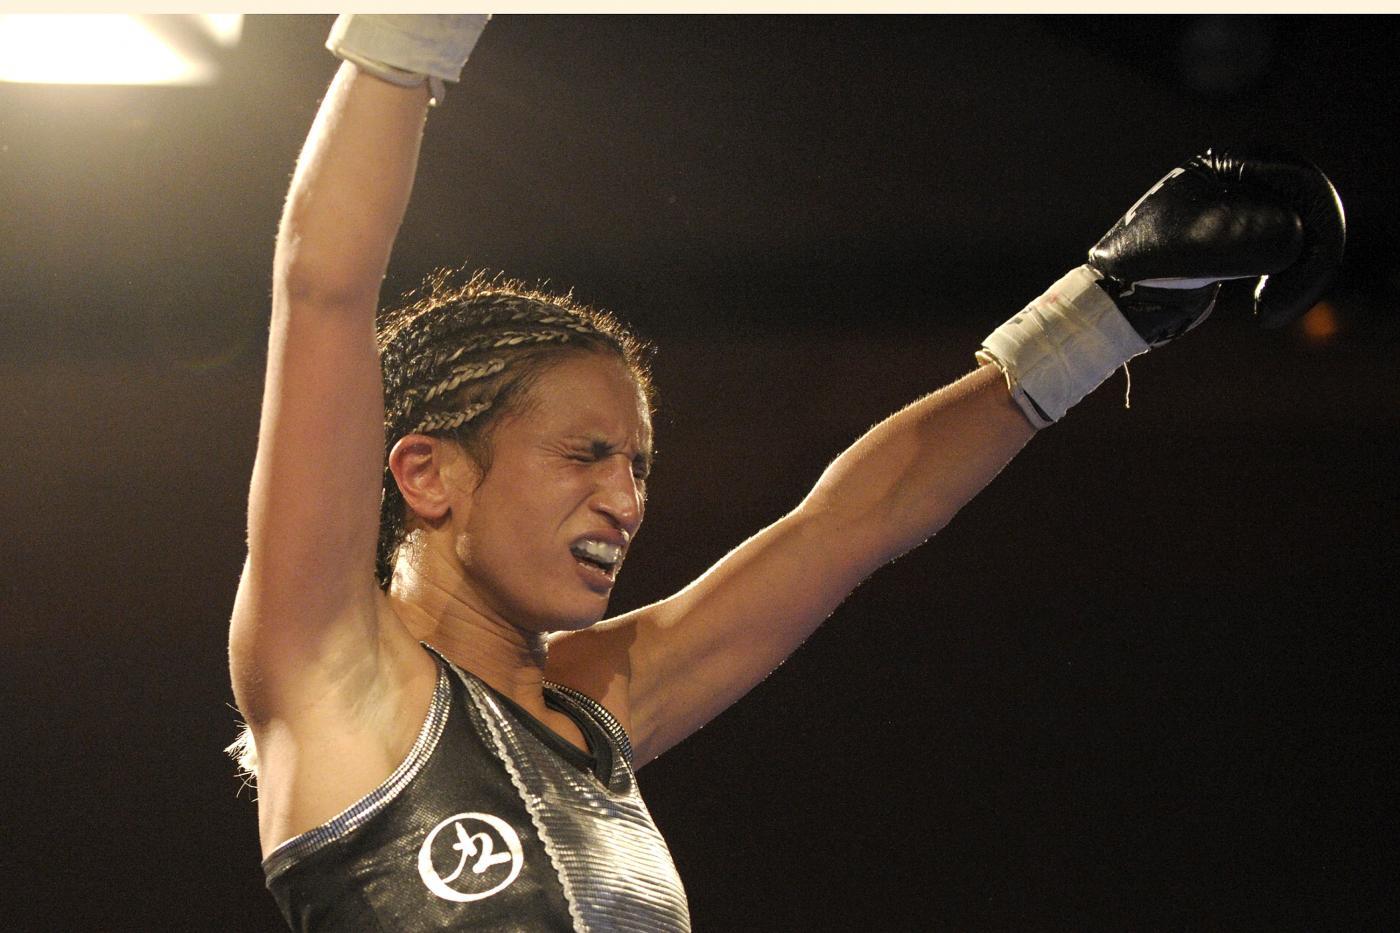 Championship Women 2010- La Presse/ Guillaume Ramon